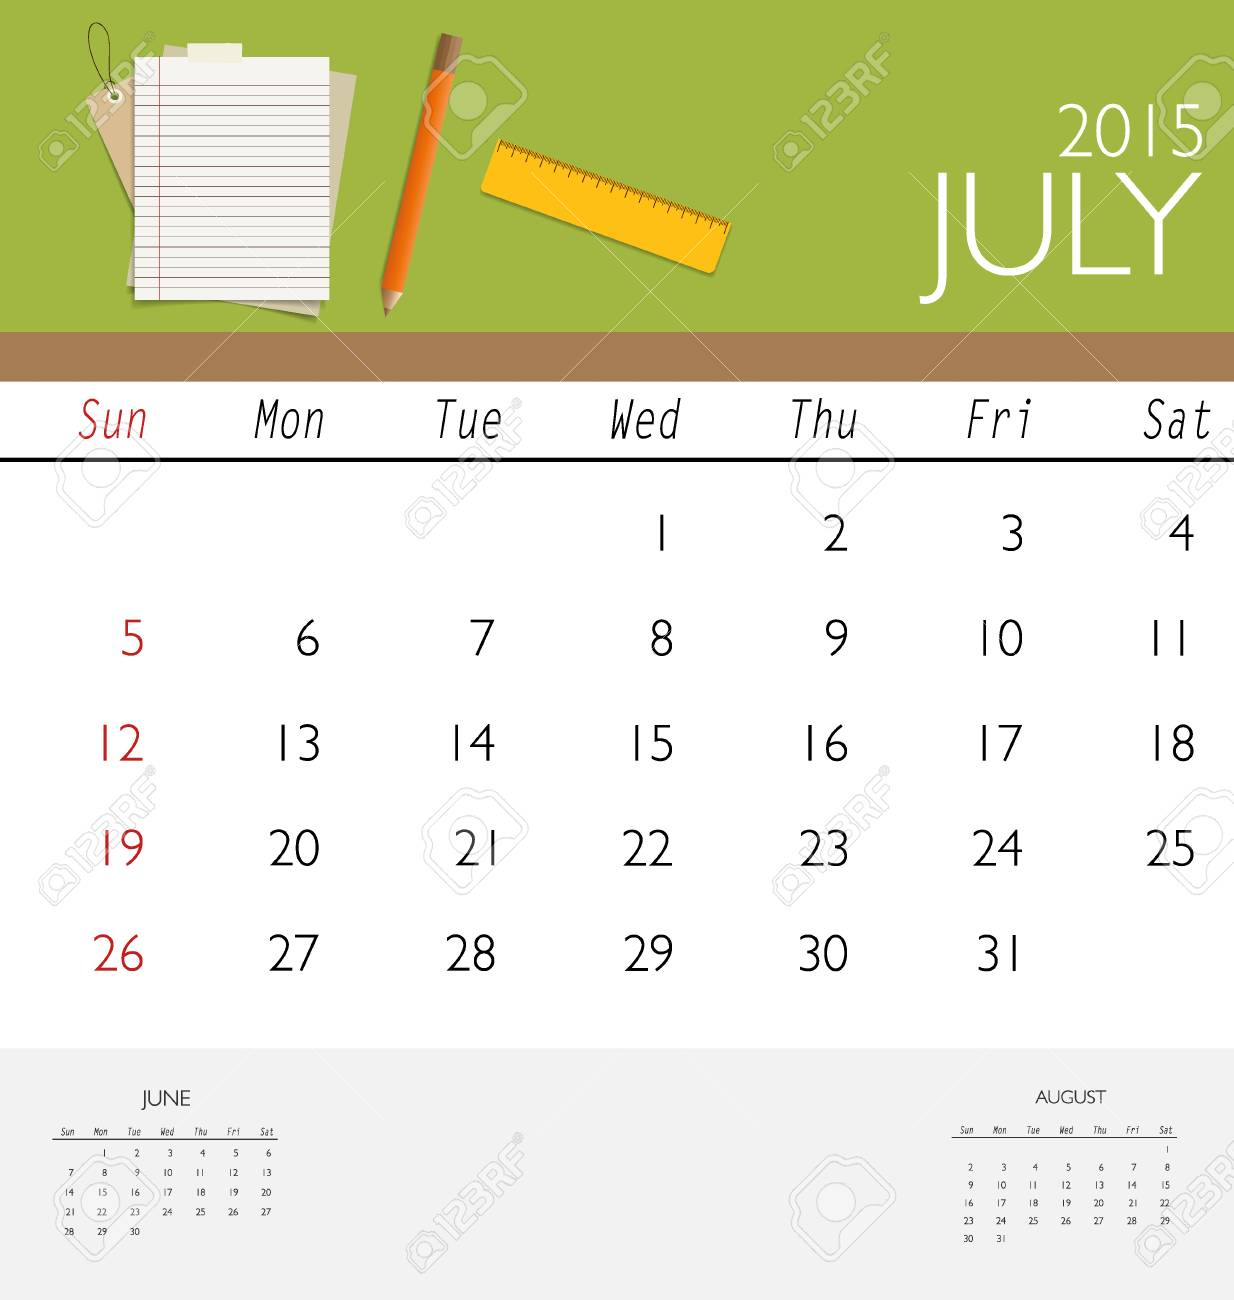 2015 Calendar, Monthly Calendar Template For July. Vector ...